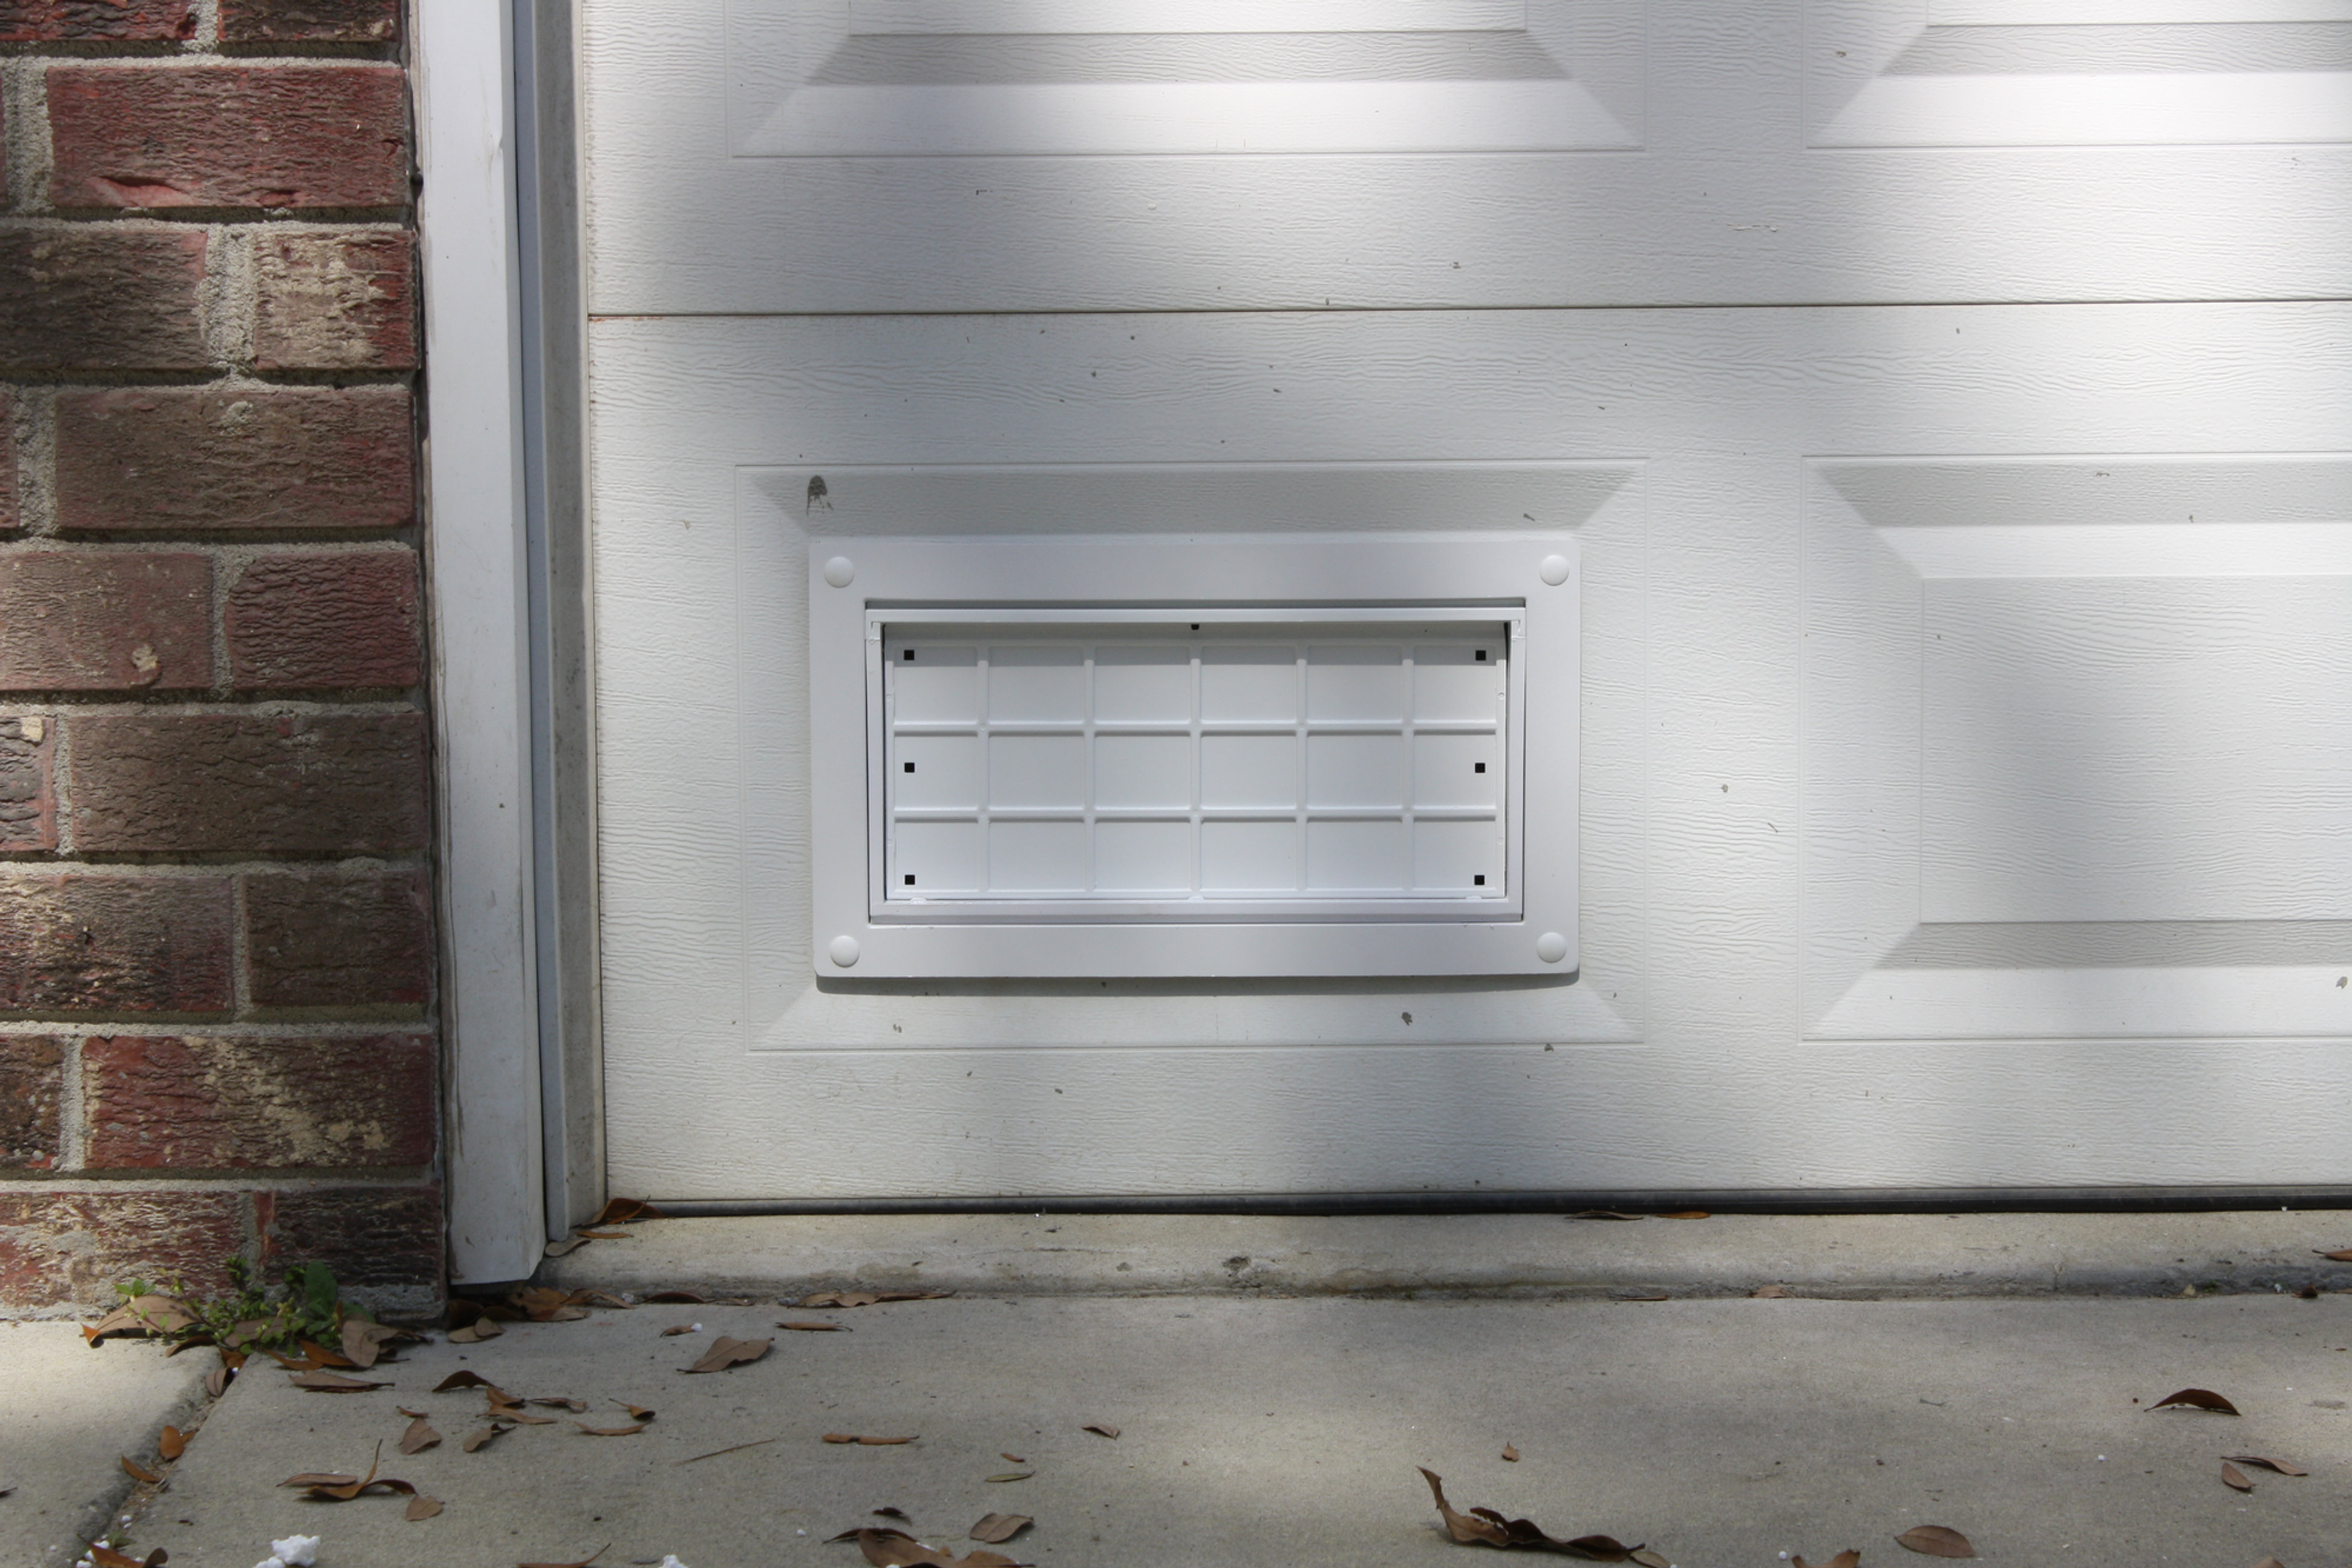 Ffnf05tf Gd G Flood Flaps Garage Door Model Gray Mysite